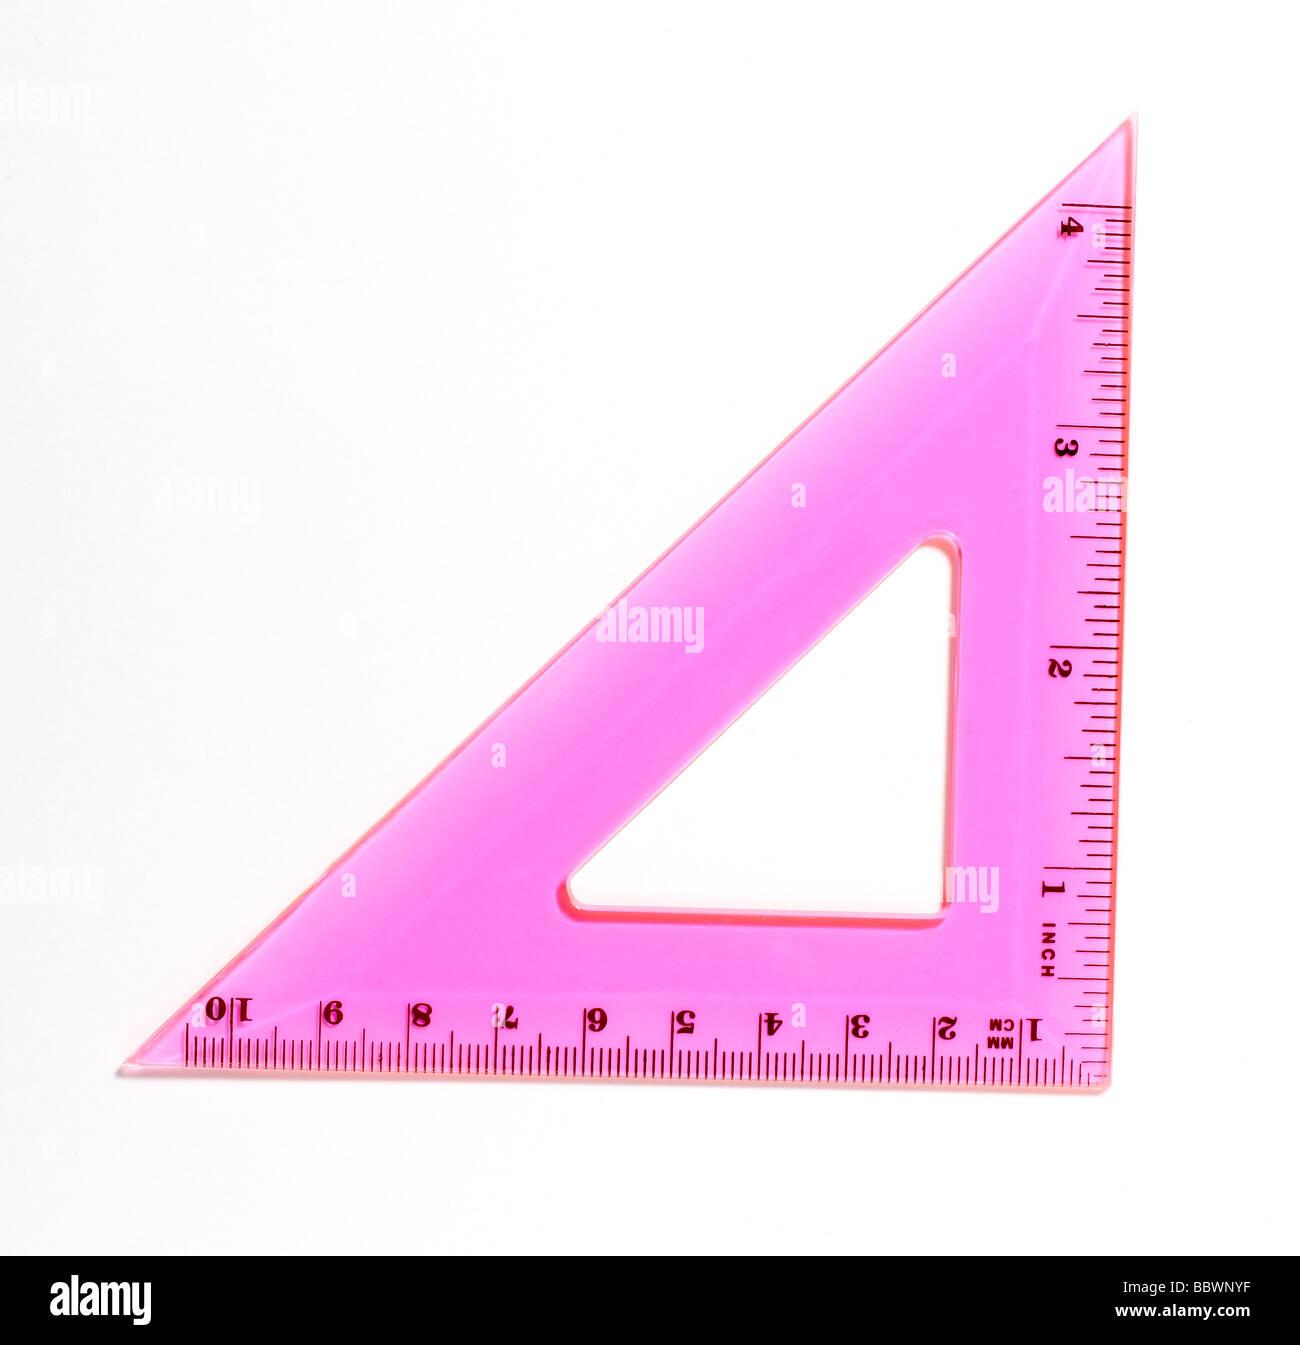 Plastic Measuring devices protractor protractors triangle square - Stock Image